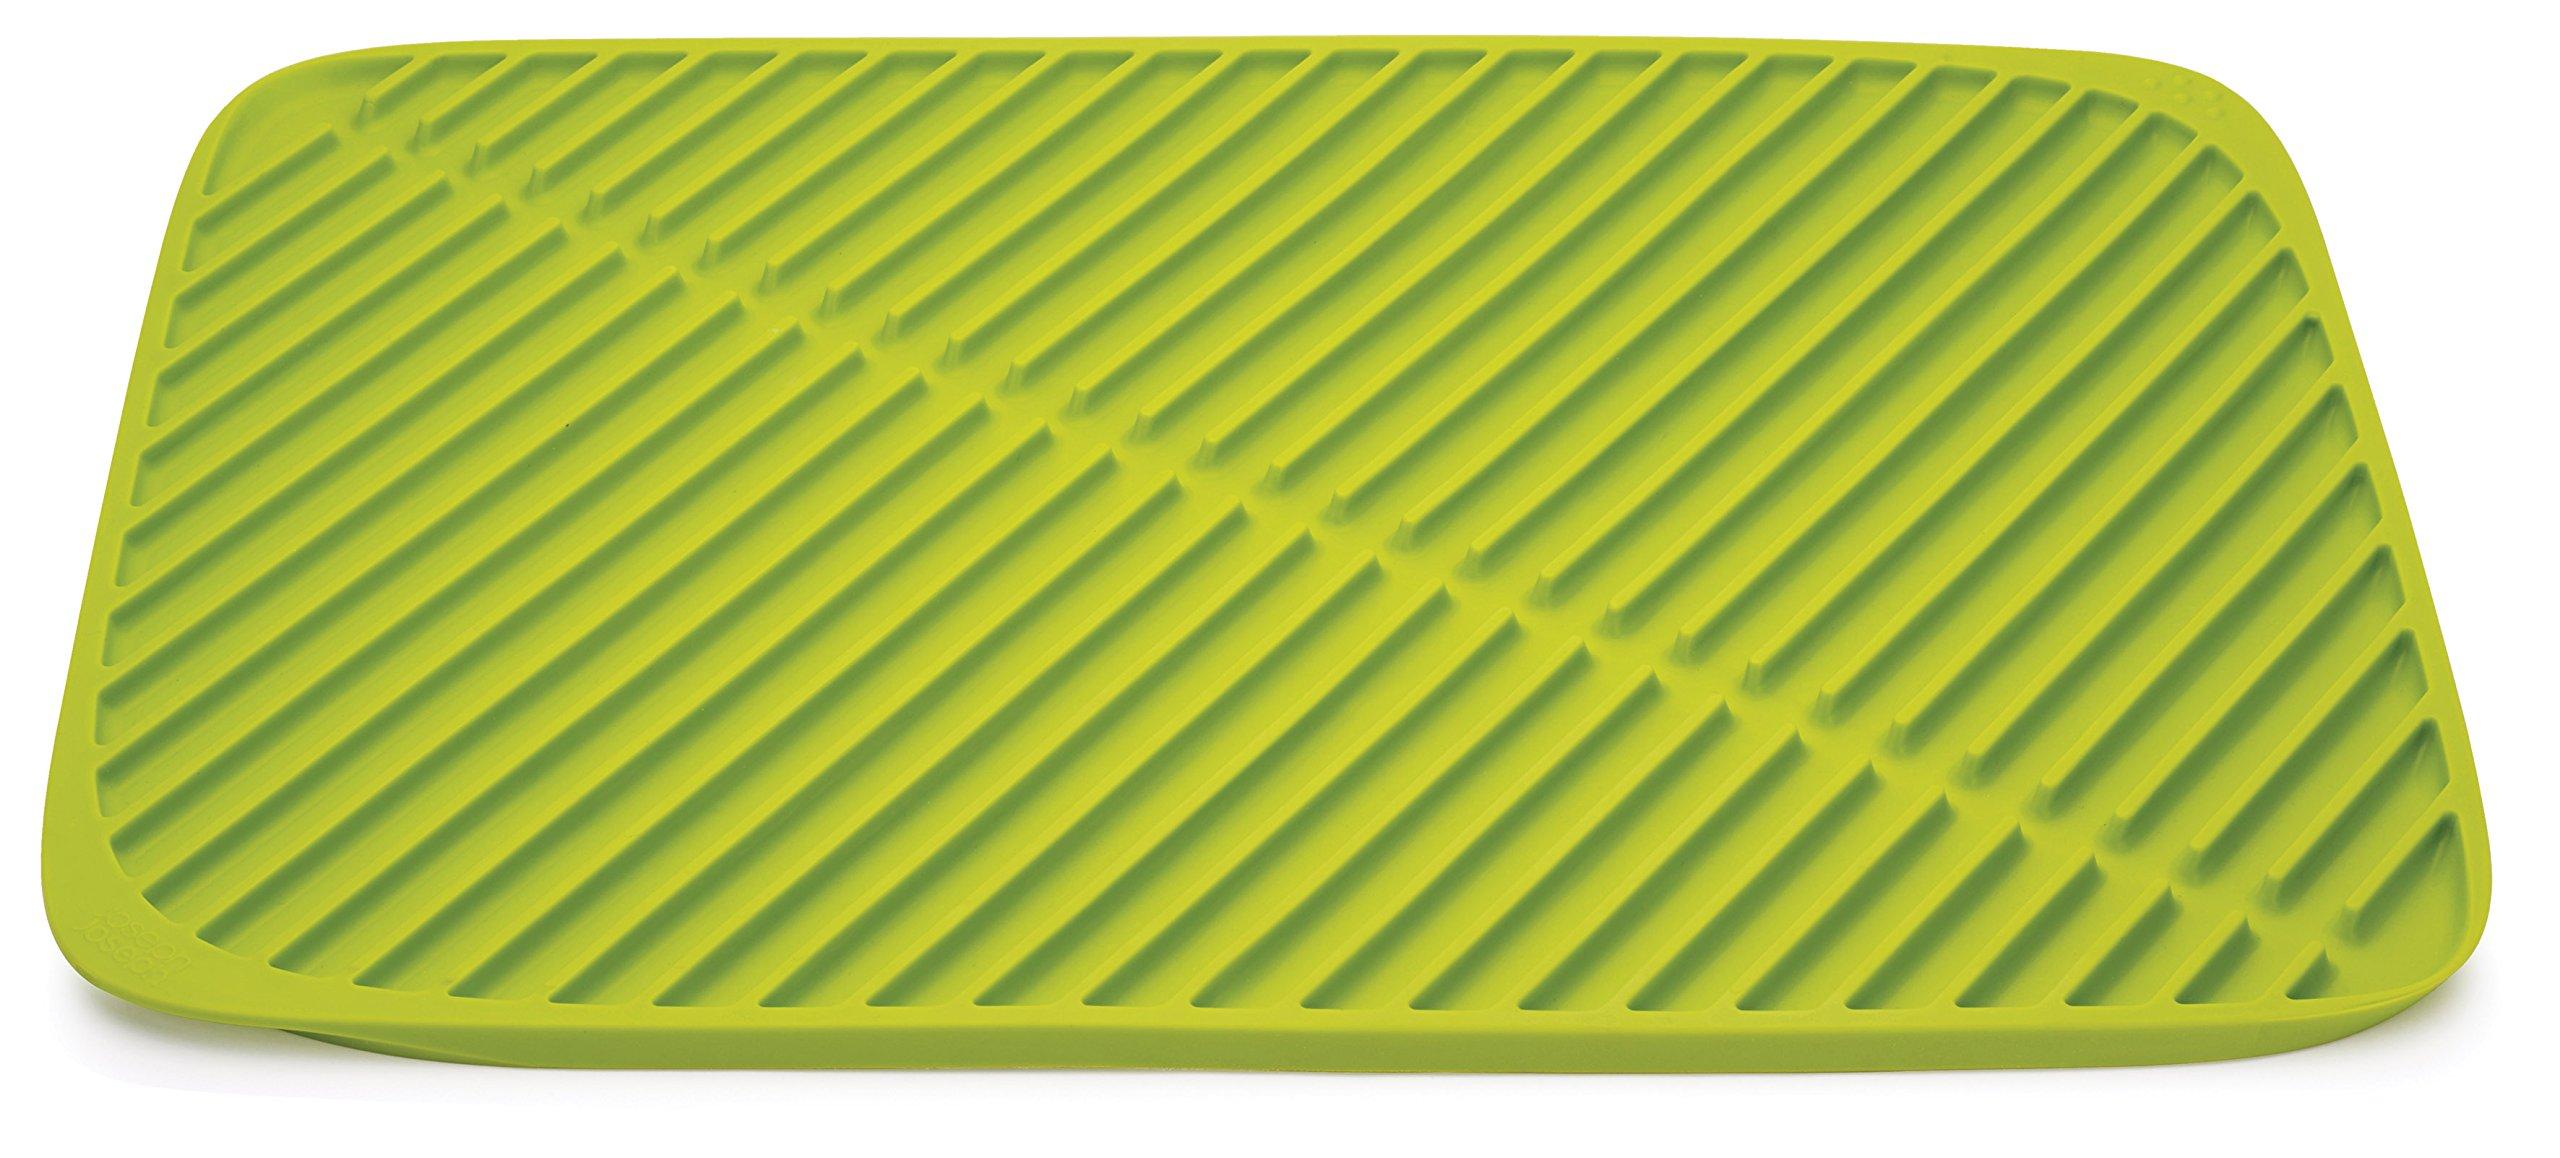 Joseph Joseph Flume, Silicona, Verde, 43.50 x 31.50 x 0.95 cm product image